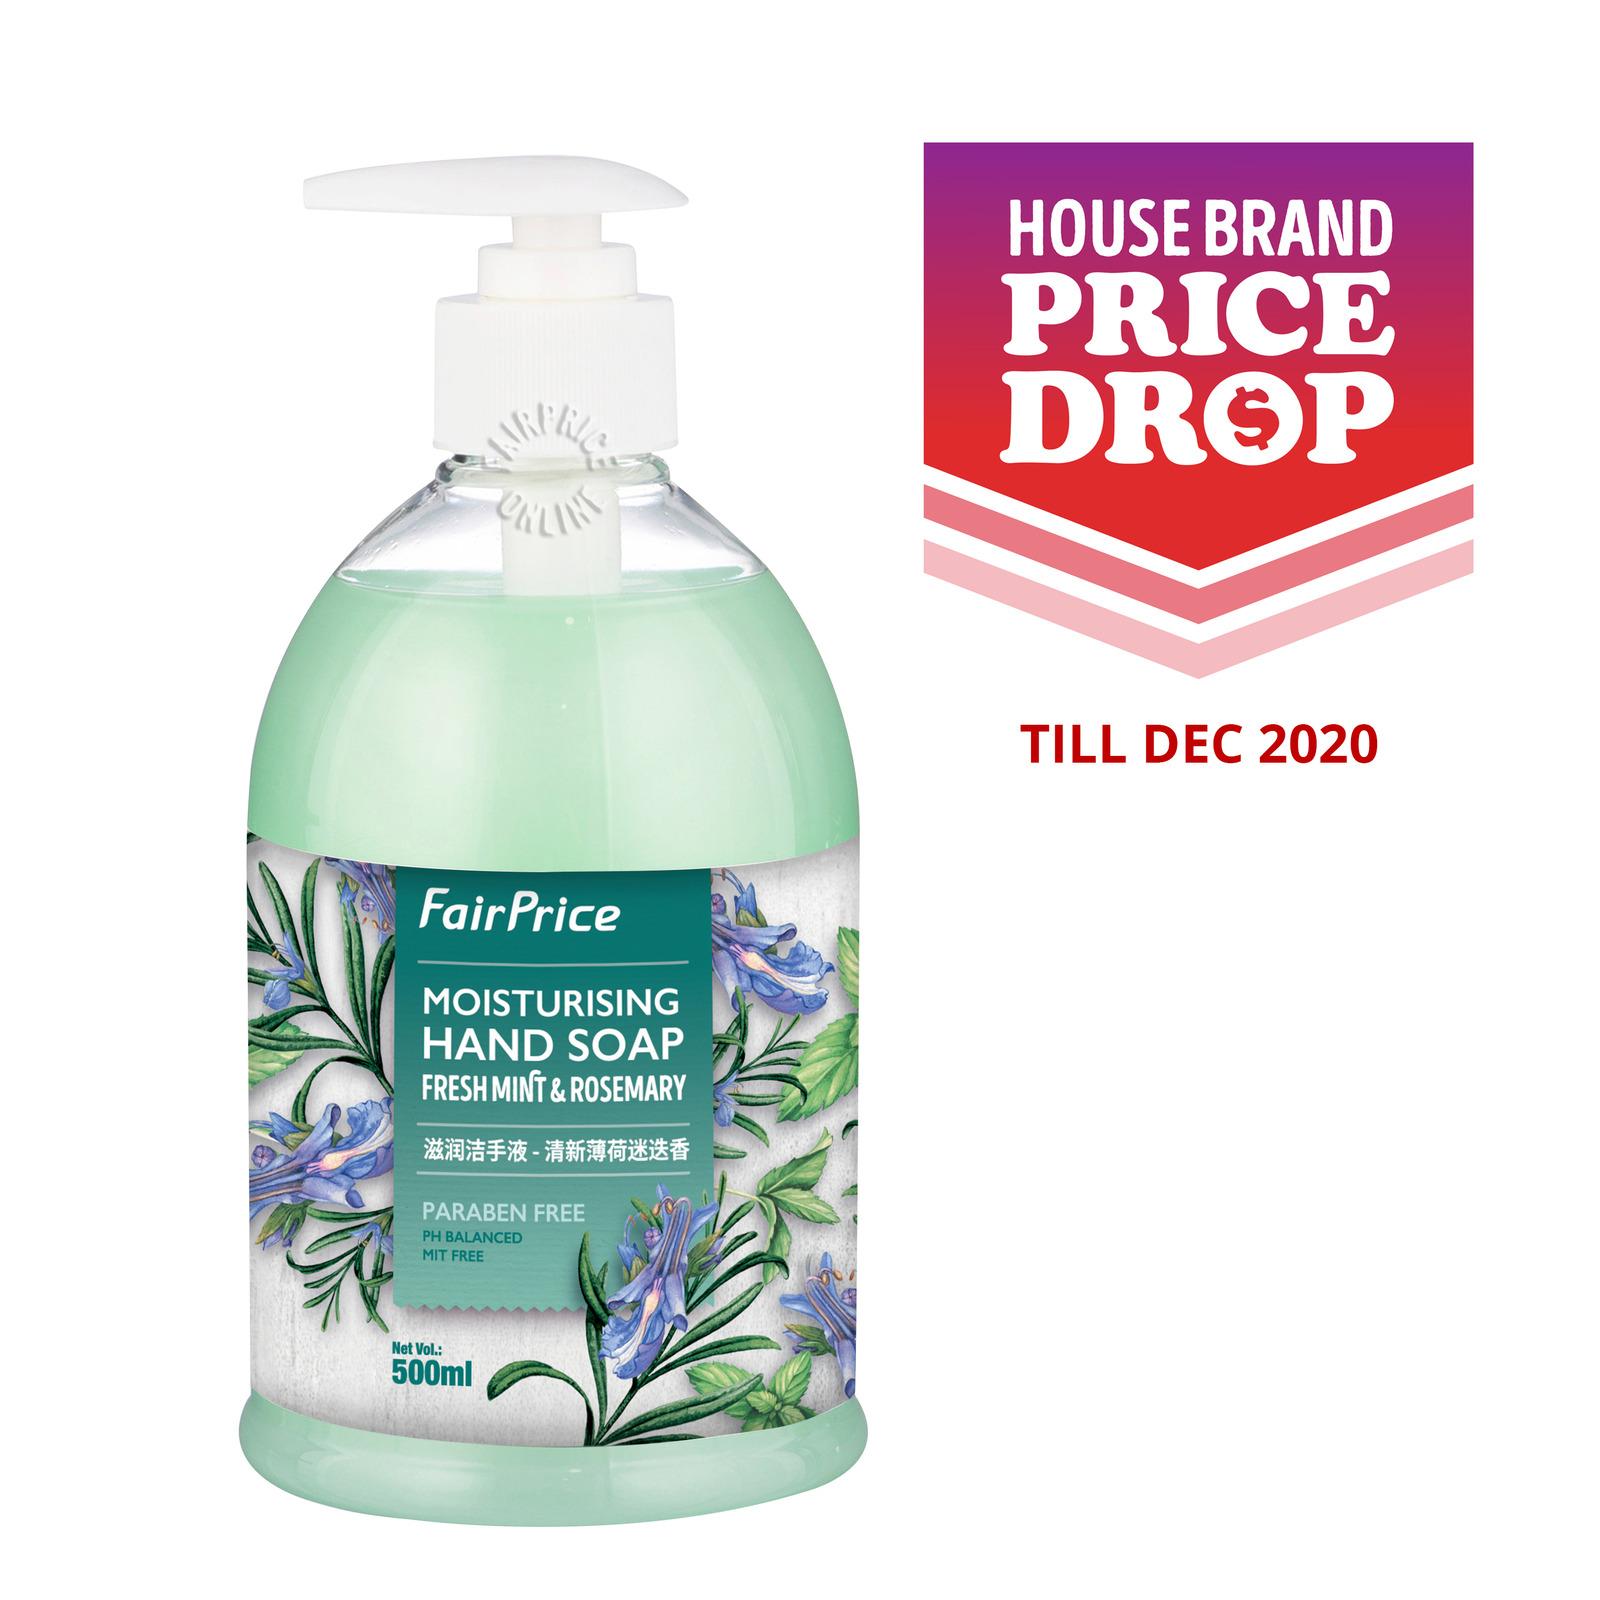 FairPrice Moisturising Hand Soap - Fresh Mint & Rosemary